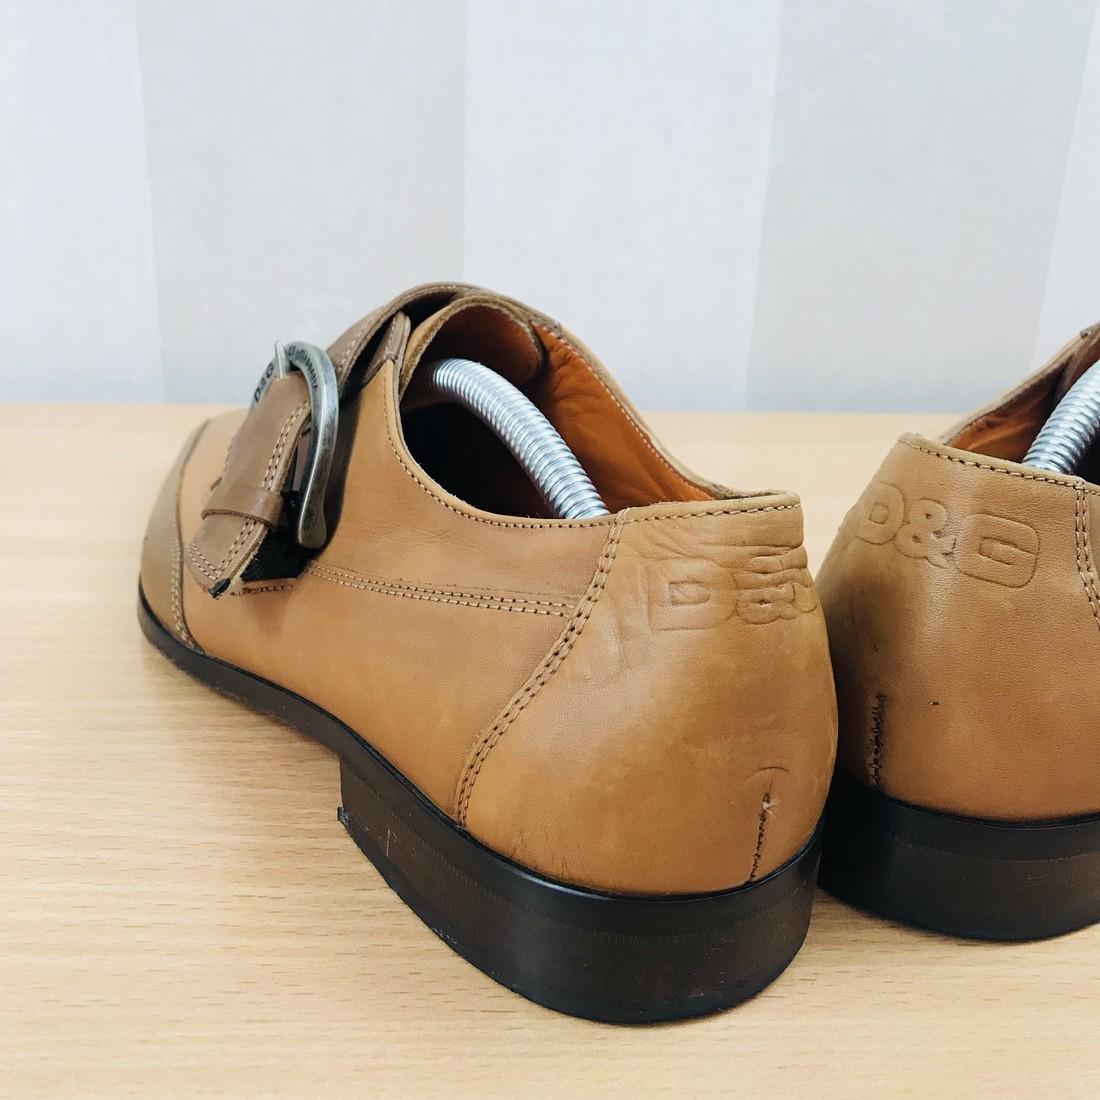 Dolce & Gabbana – Leather Shoes Size EUR 42 UK 8.5 US 9 - 7